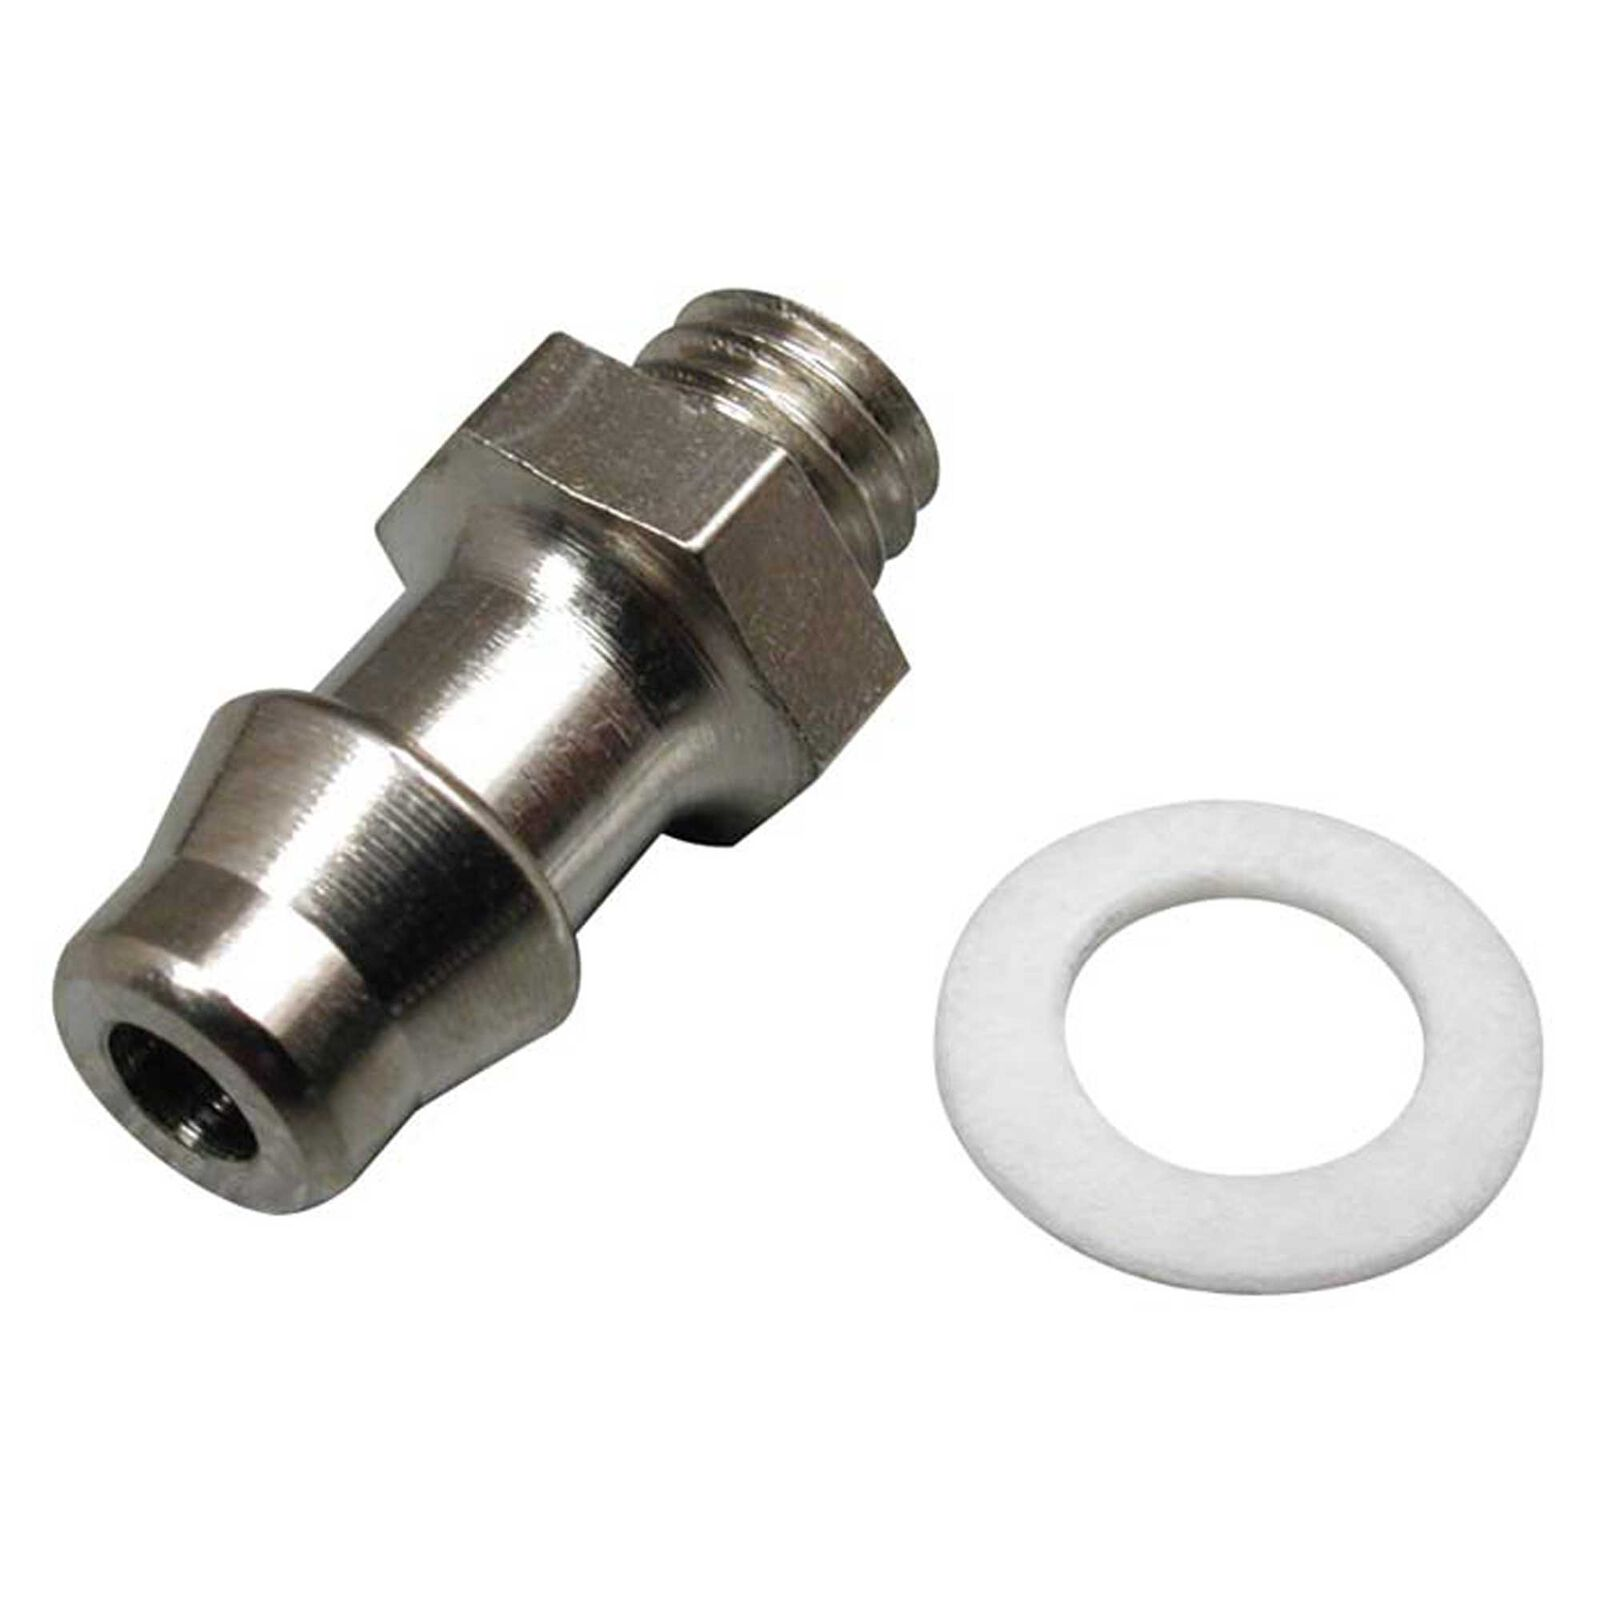 Fuel Inlet Nipple: 12-240